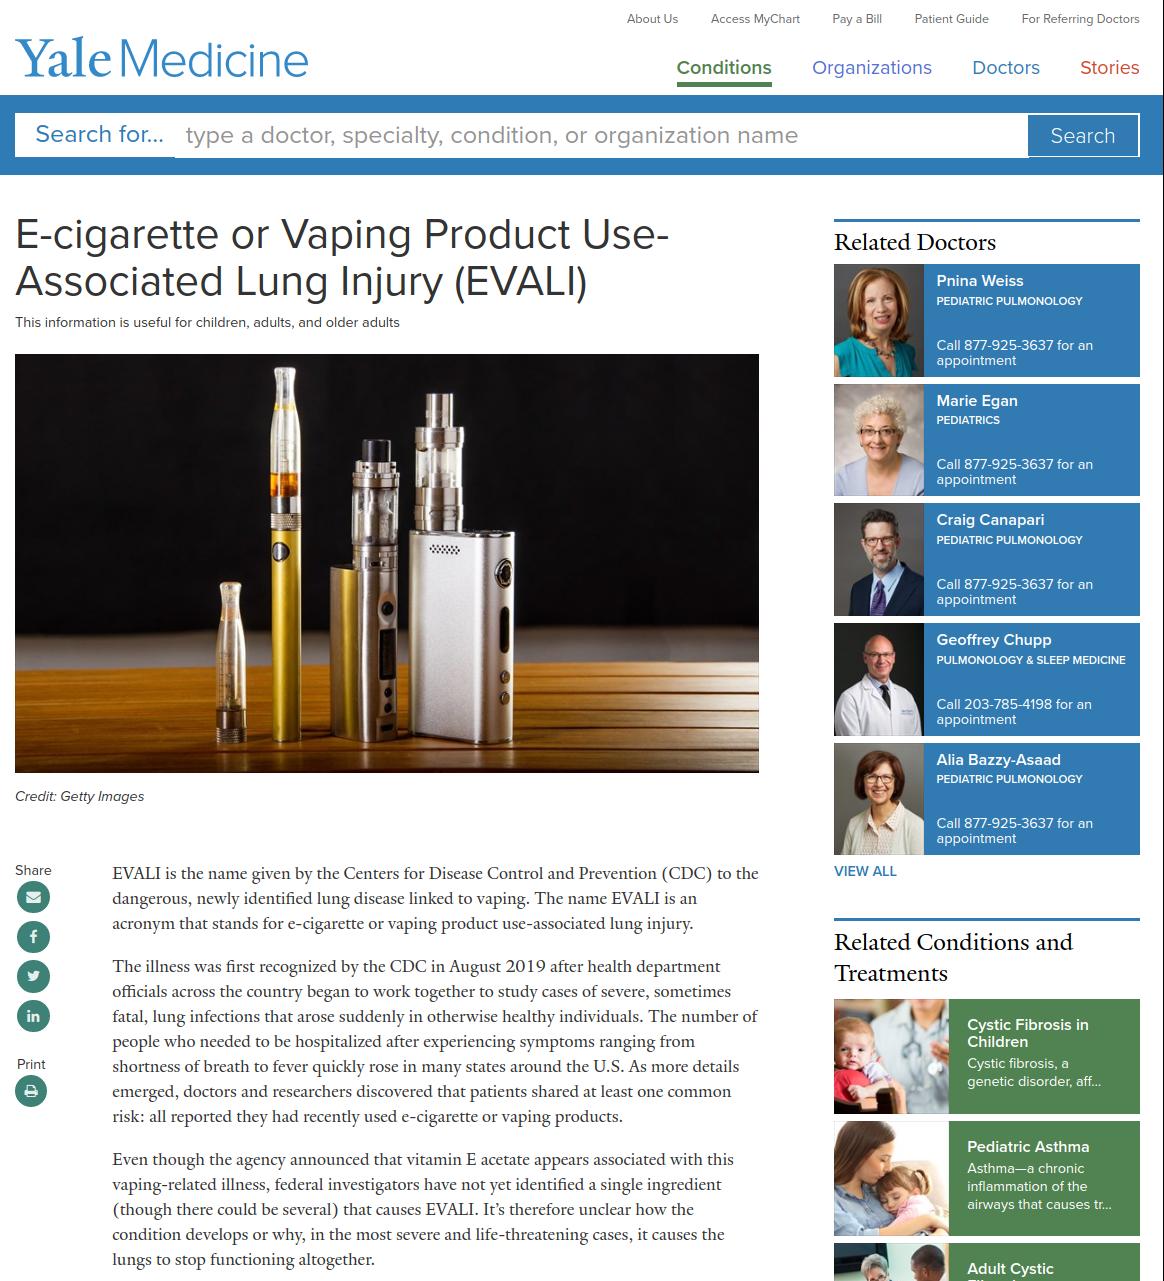 Yale Medical On EVALI